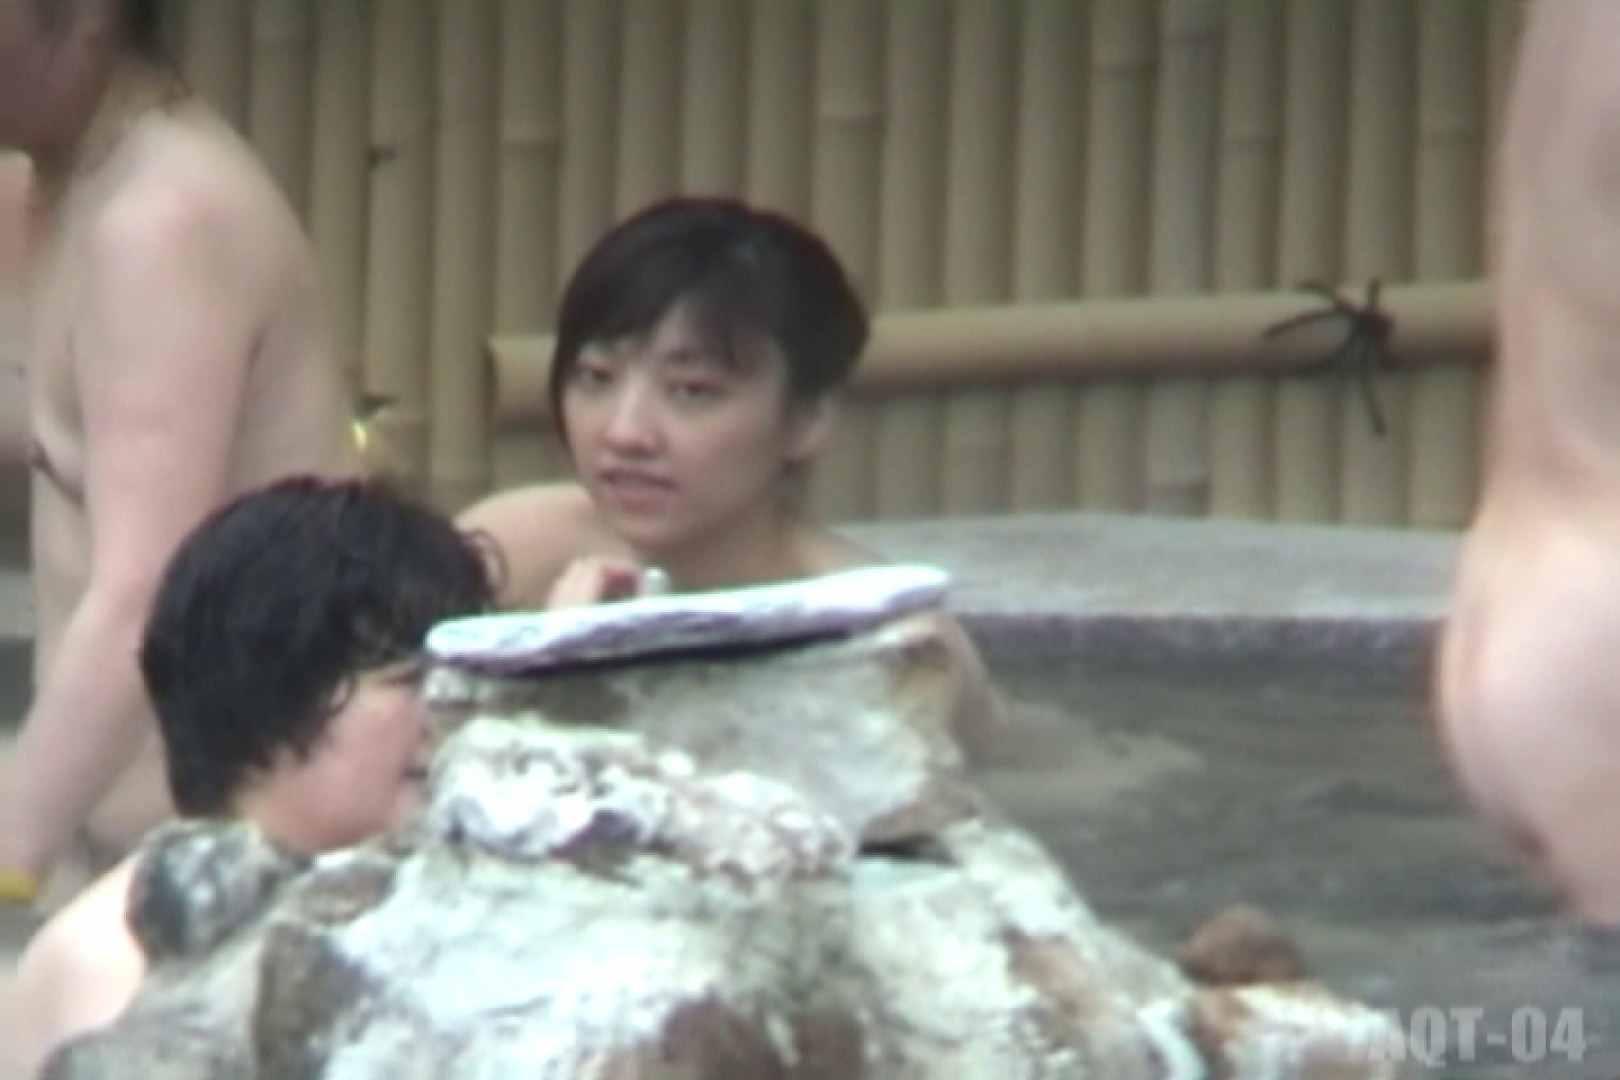 Aquaな露天風呂Vol.743 盗撮映像  75Pix 1